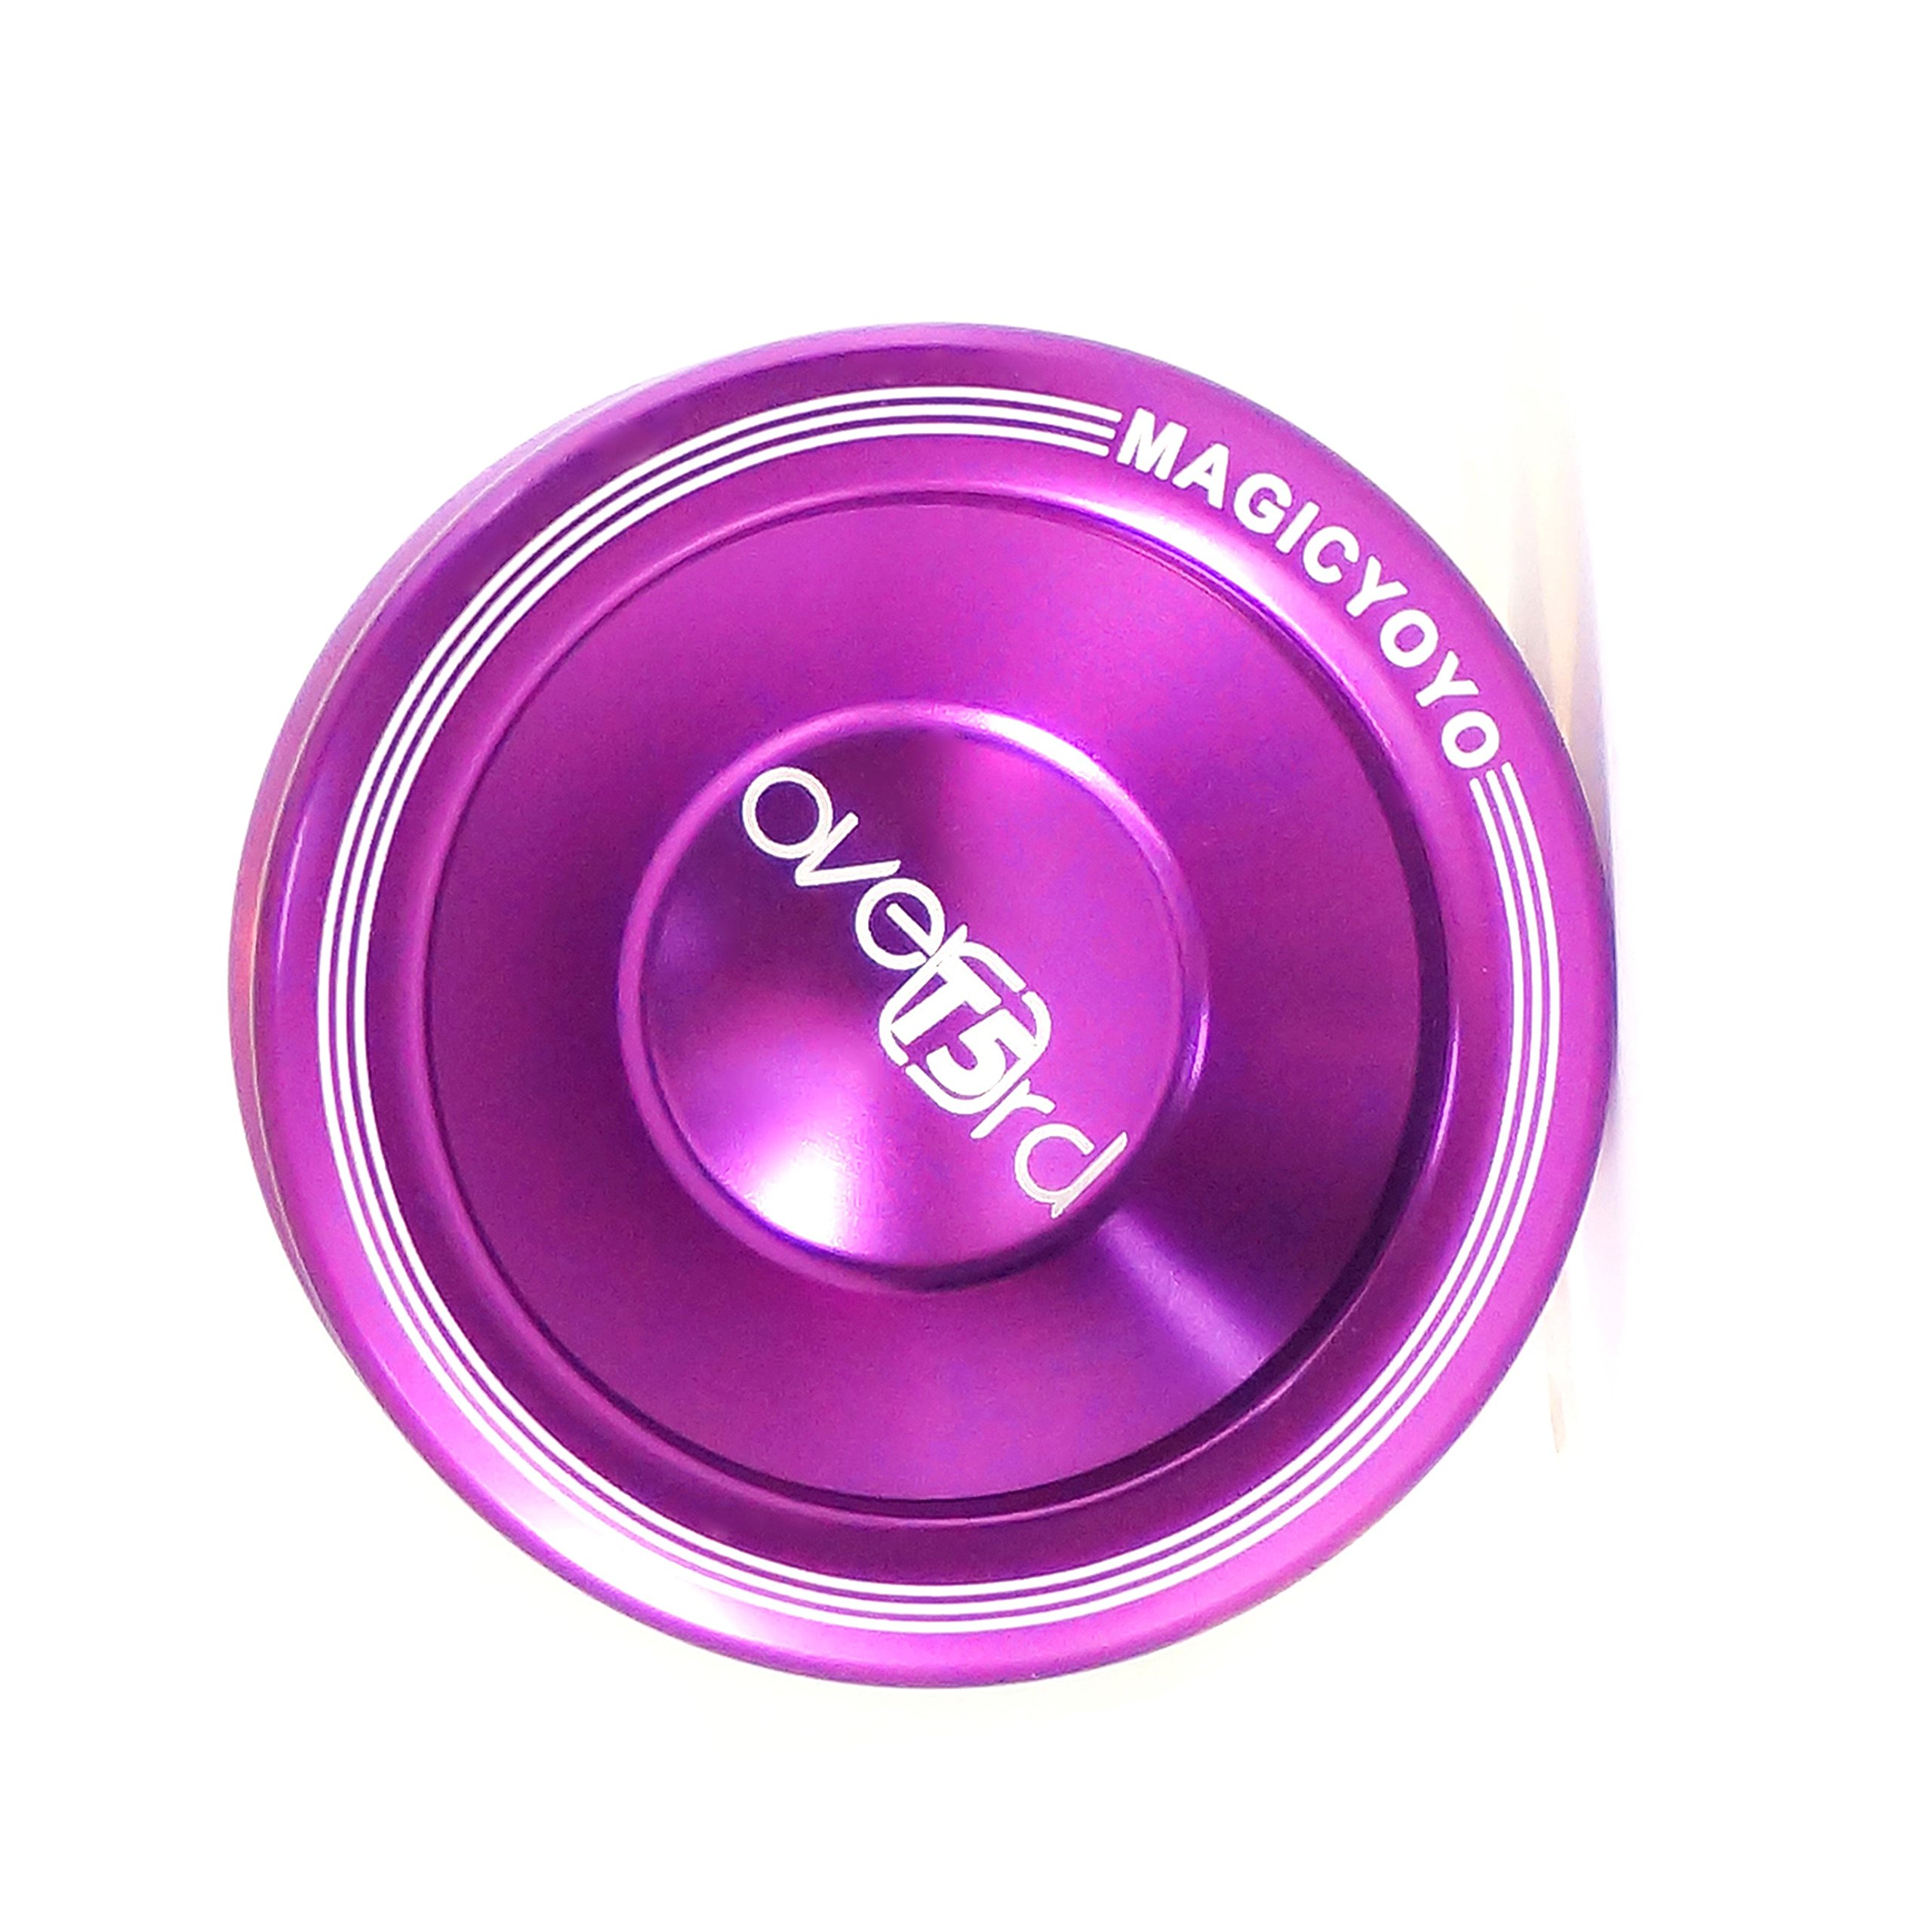 MAGICYOYO T5 Overlord Purple Aluminum Smoothless Professional Yoyo